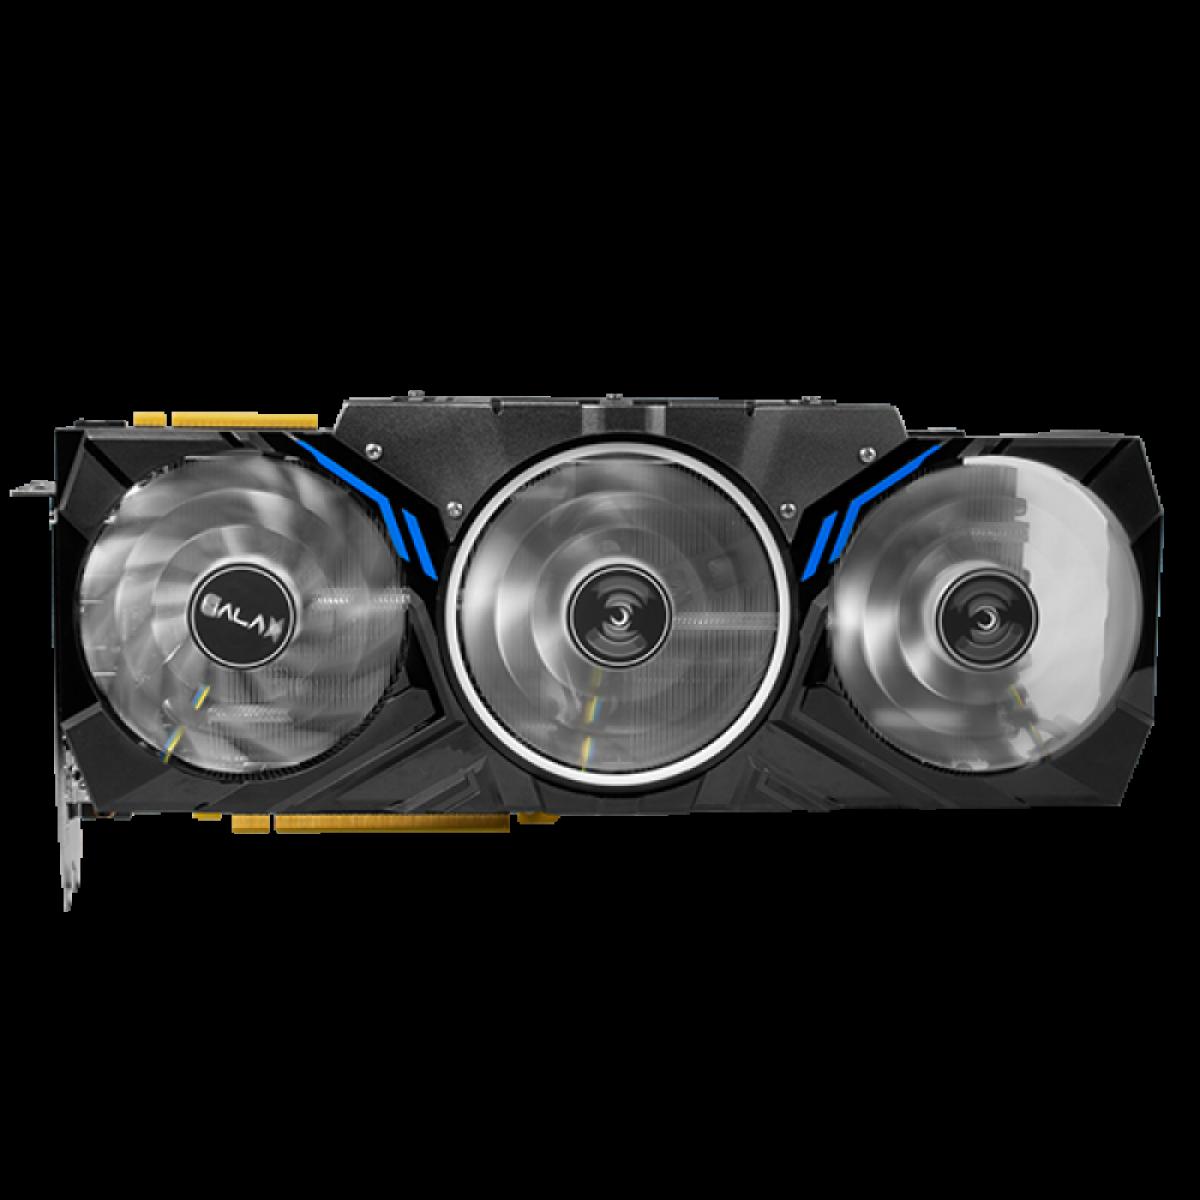 Placa de Vídeo Galax GeForce RTX 2070 Super Work The Frames Edition, 8GB GDDR6